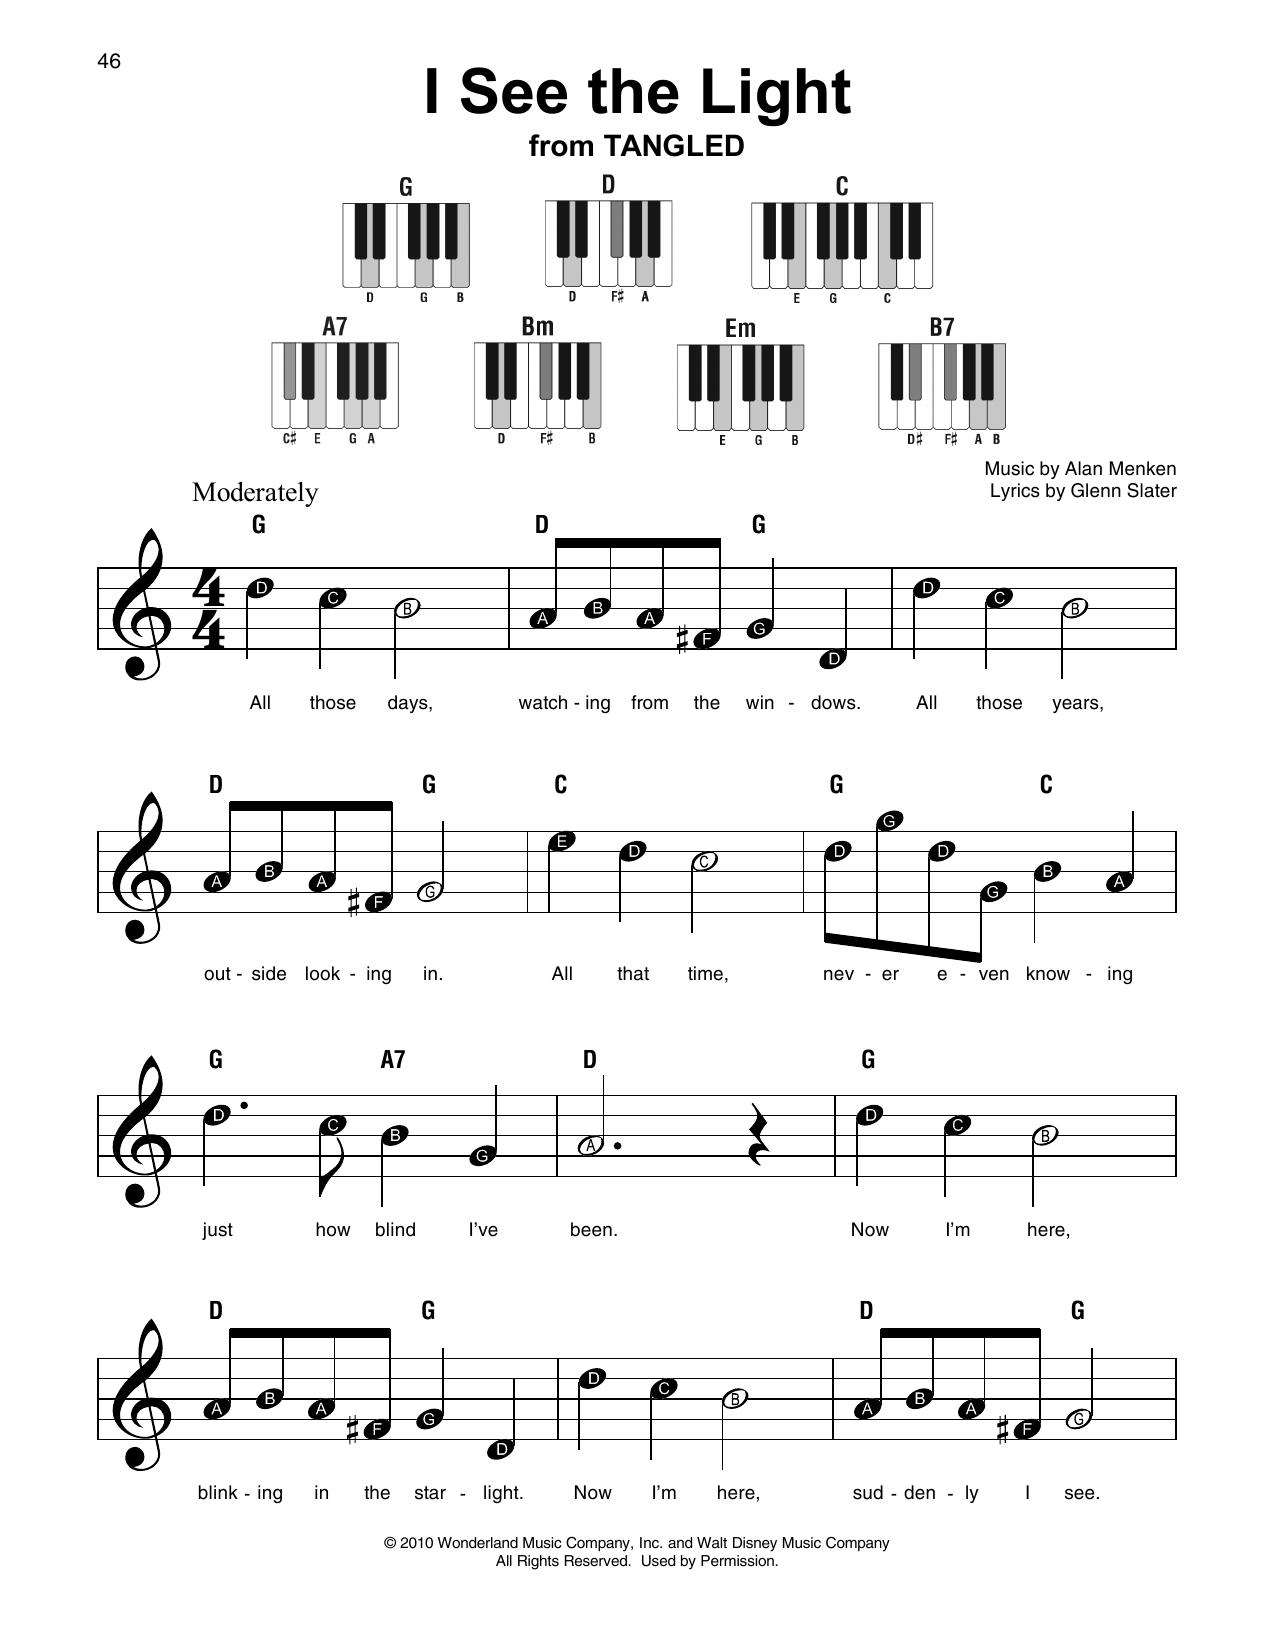 I see the light tangled piano pdf